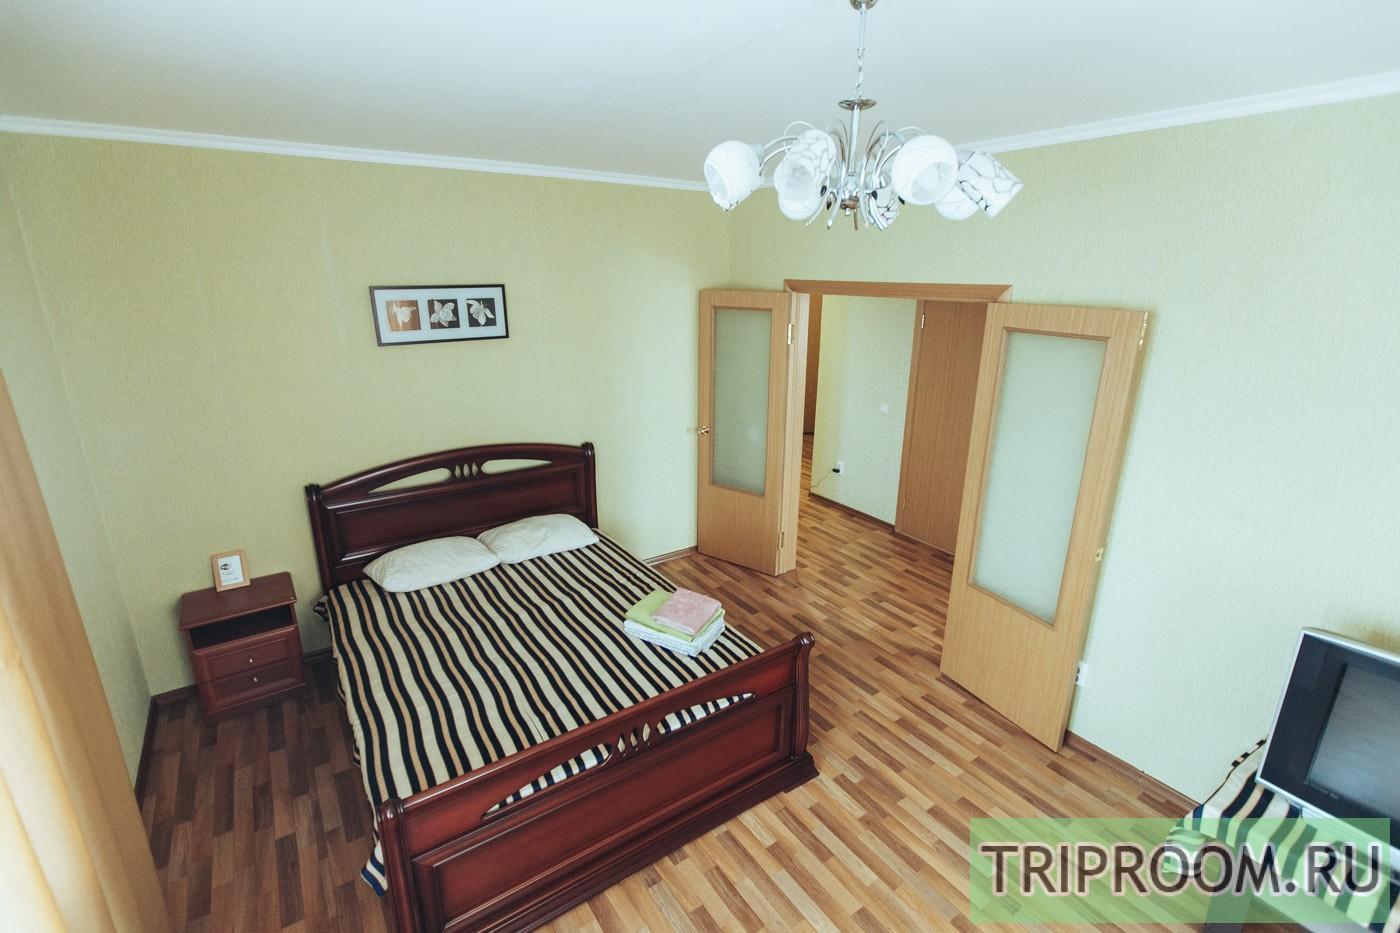 1-комнатная квартира посуточно (вариант № 30979), ул. Петра Смородина улица, фото № 1